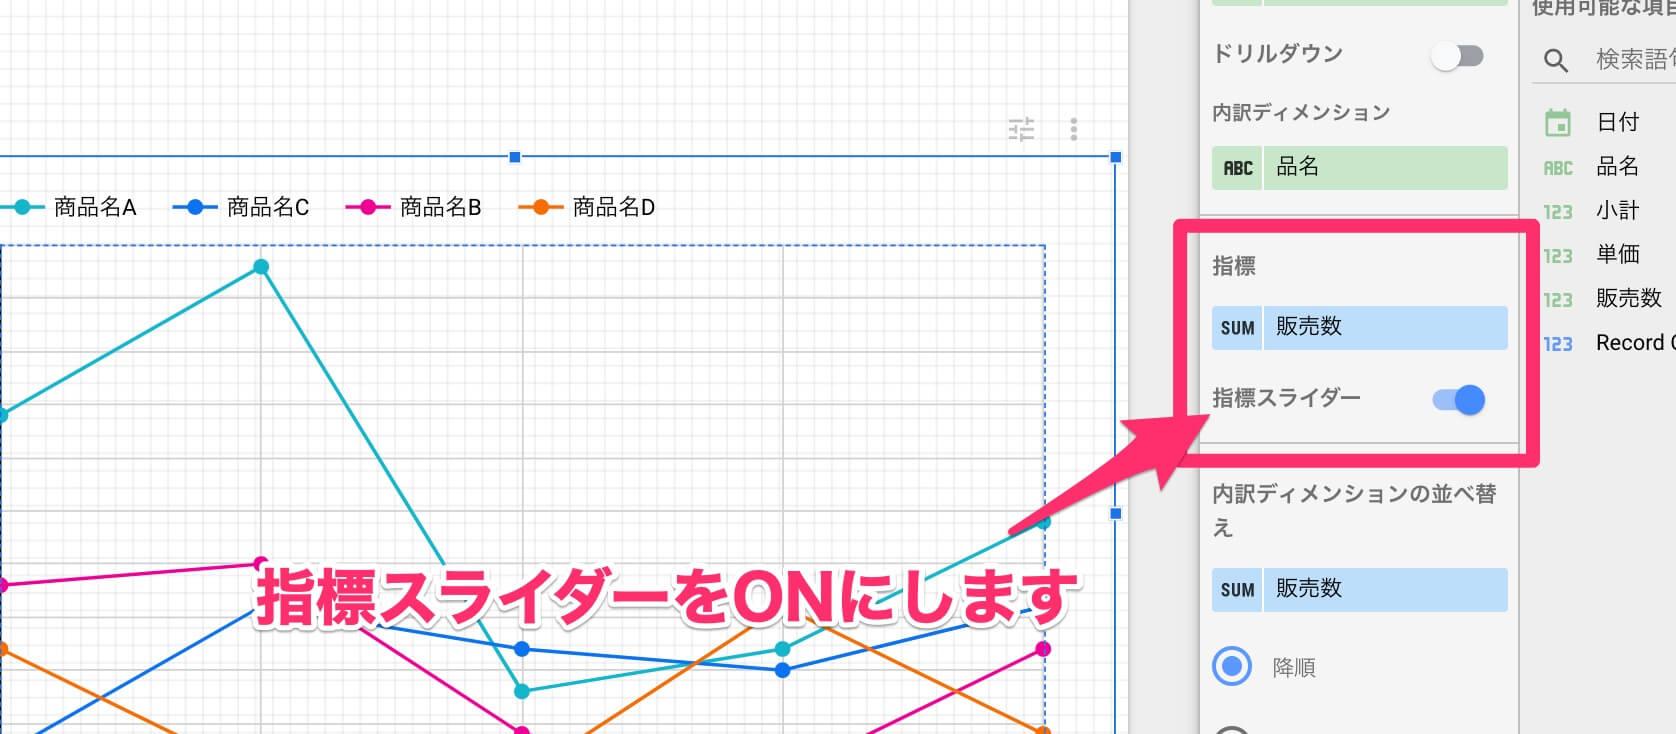 【Googleデータポータル】指標をフィルタリングする「スライダー」の使い方。閲覧ユーザー側で自由に操作可能